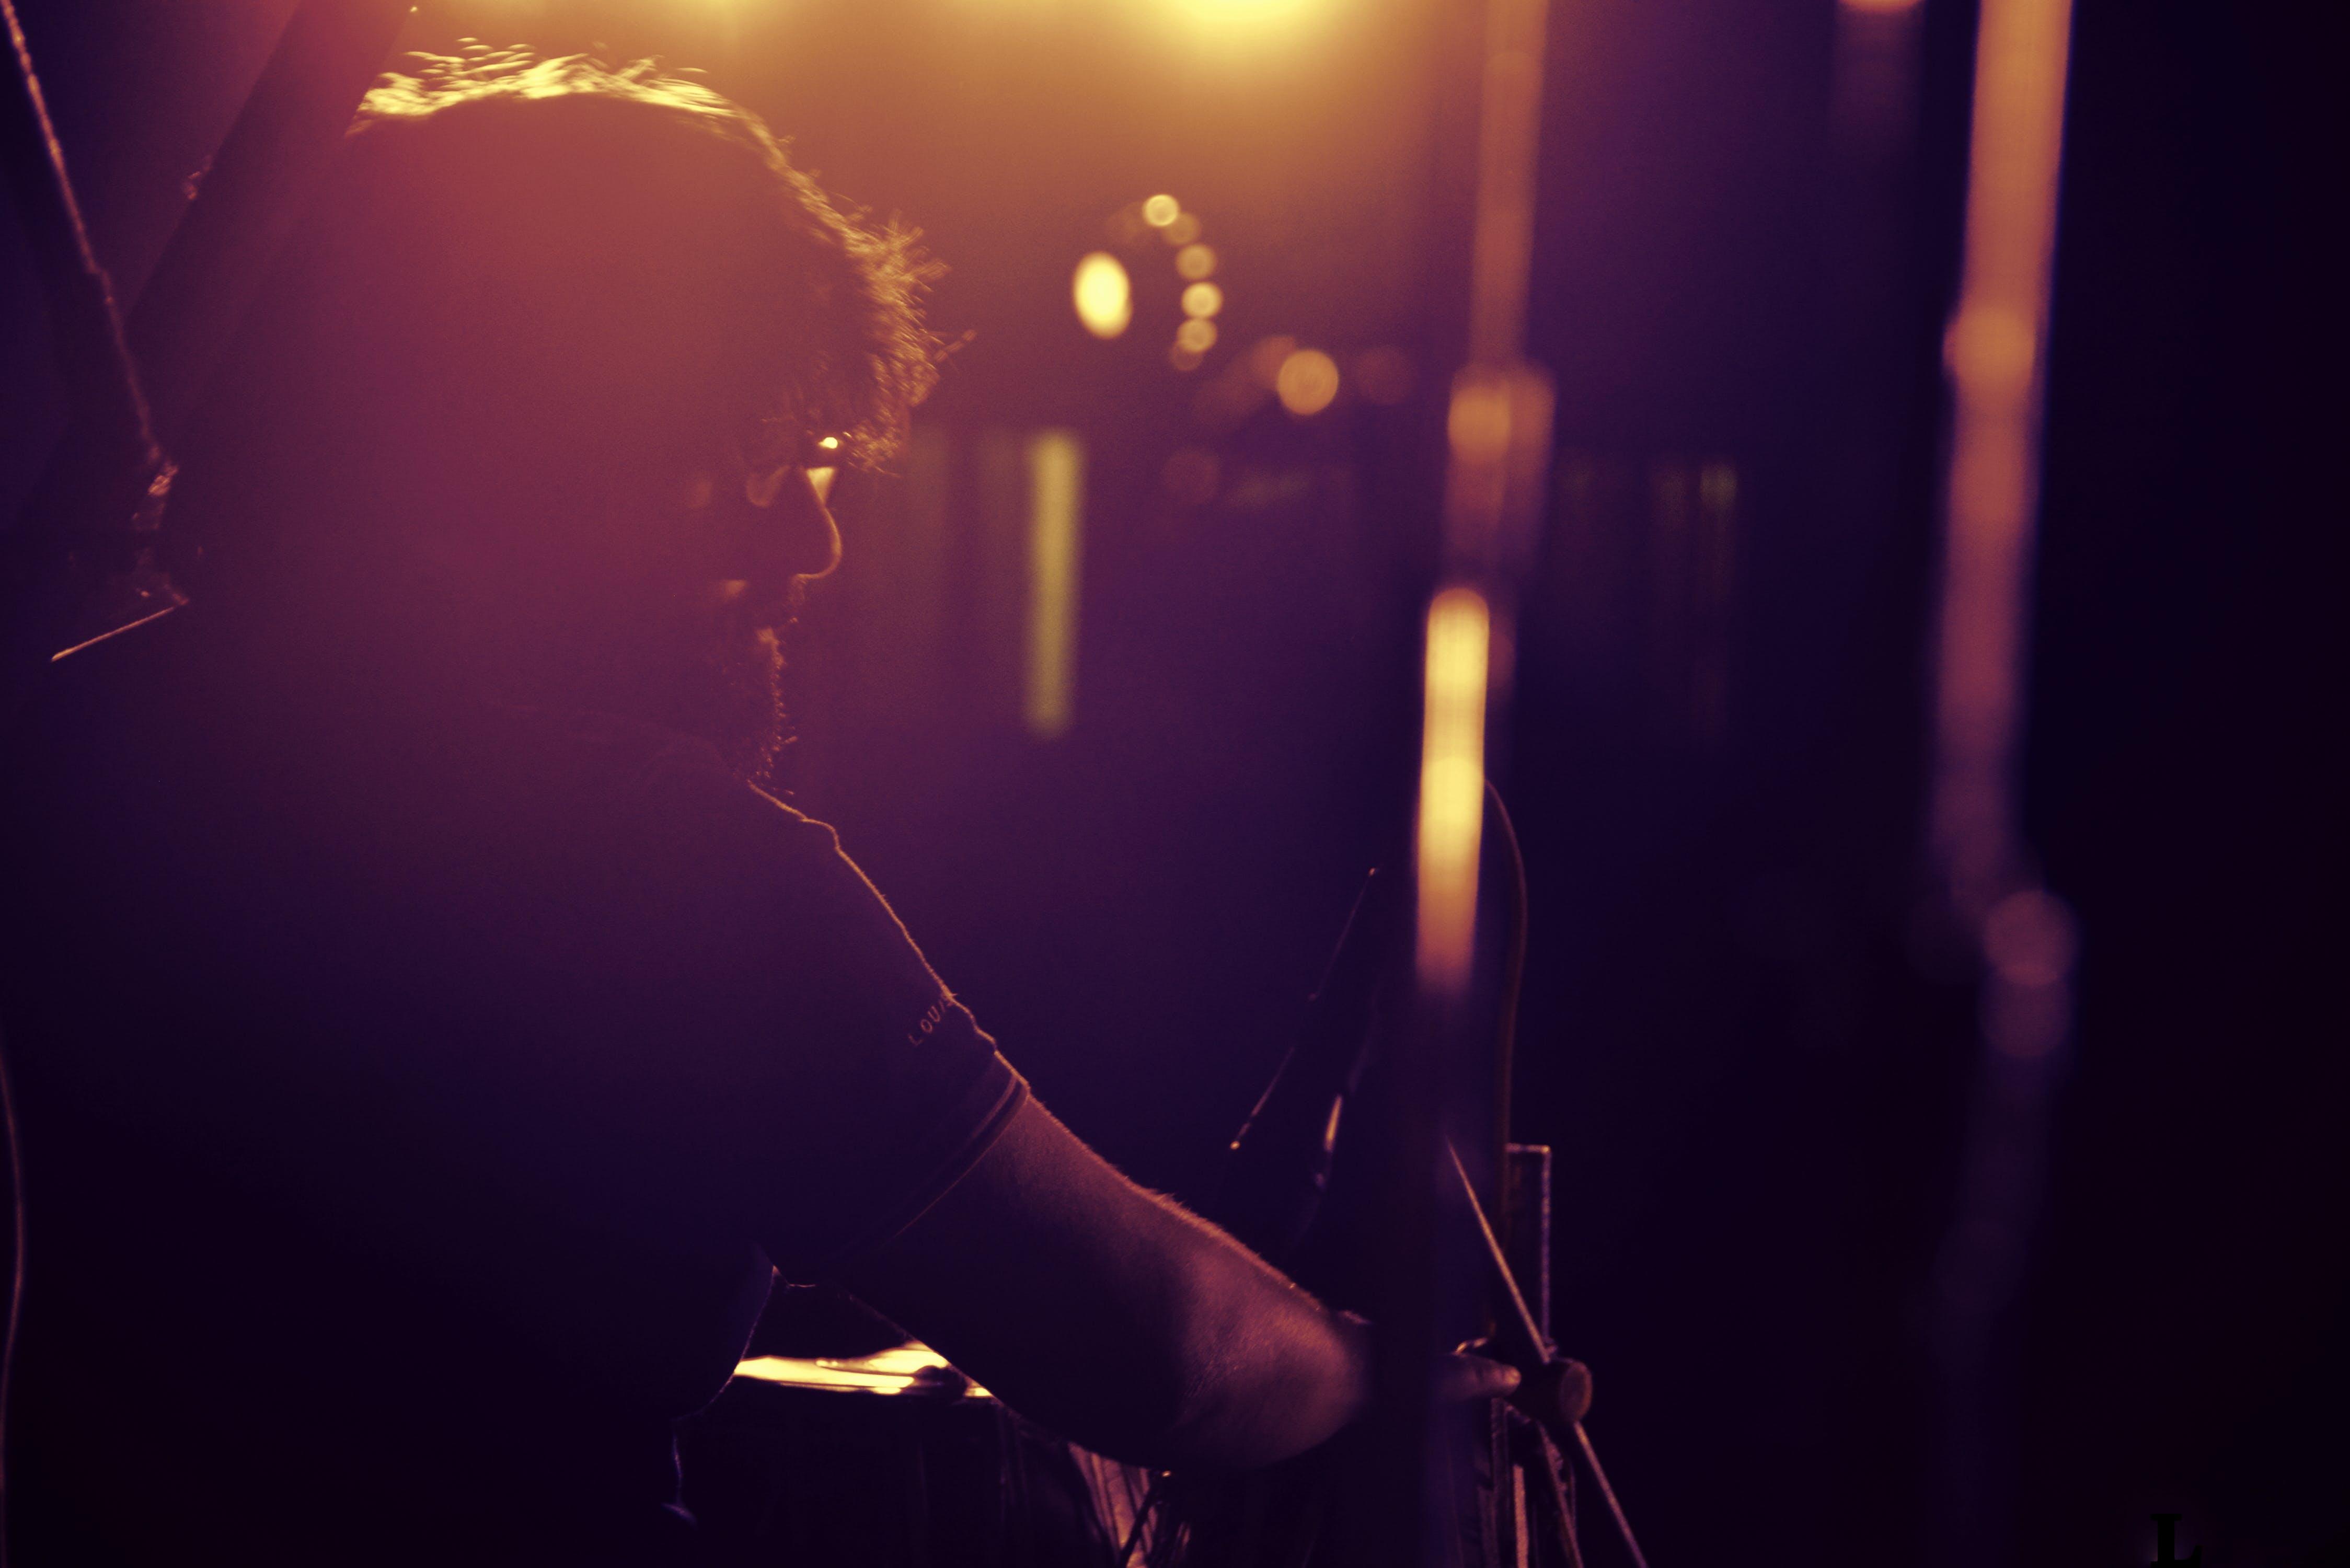 Free stock photo of artist, concert, live performance, night